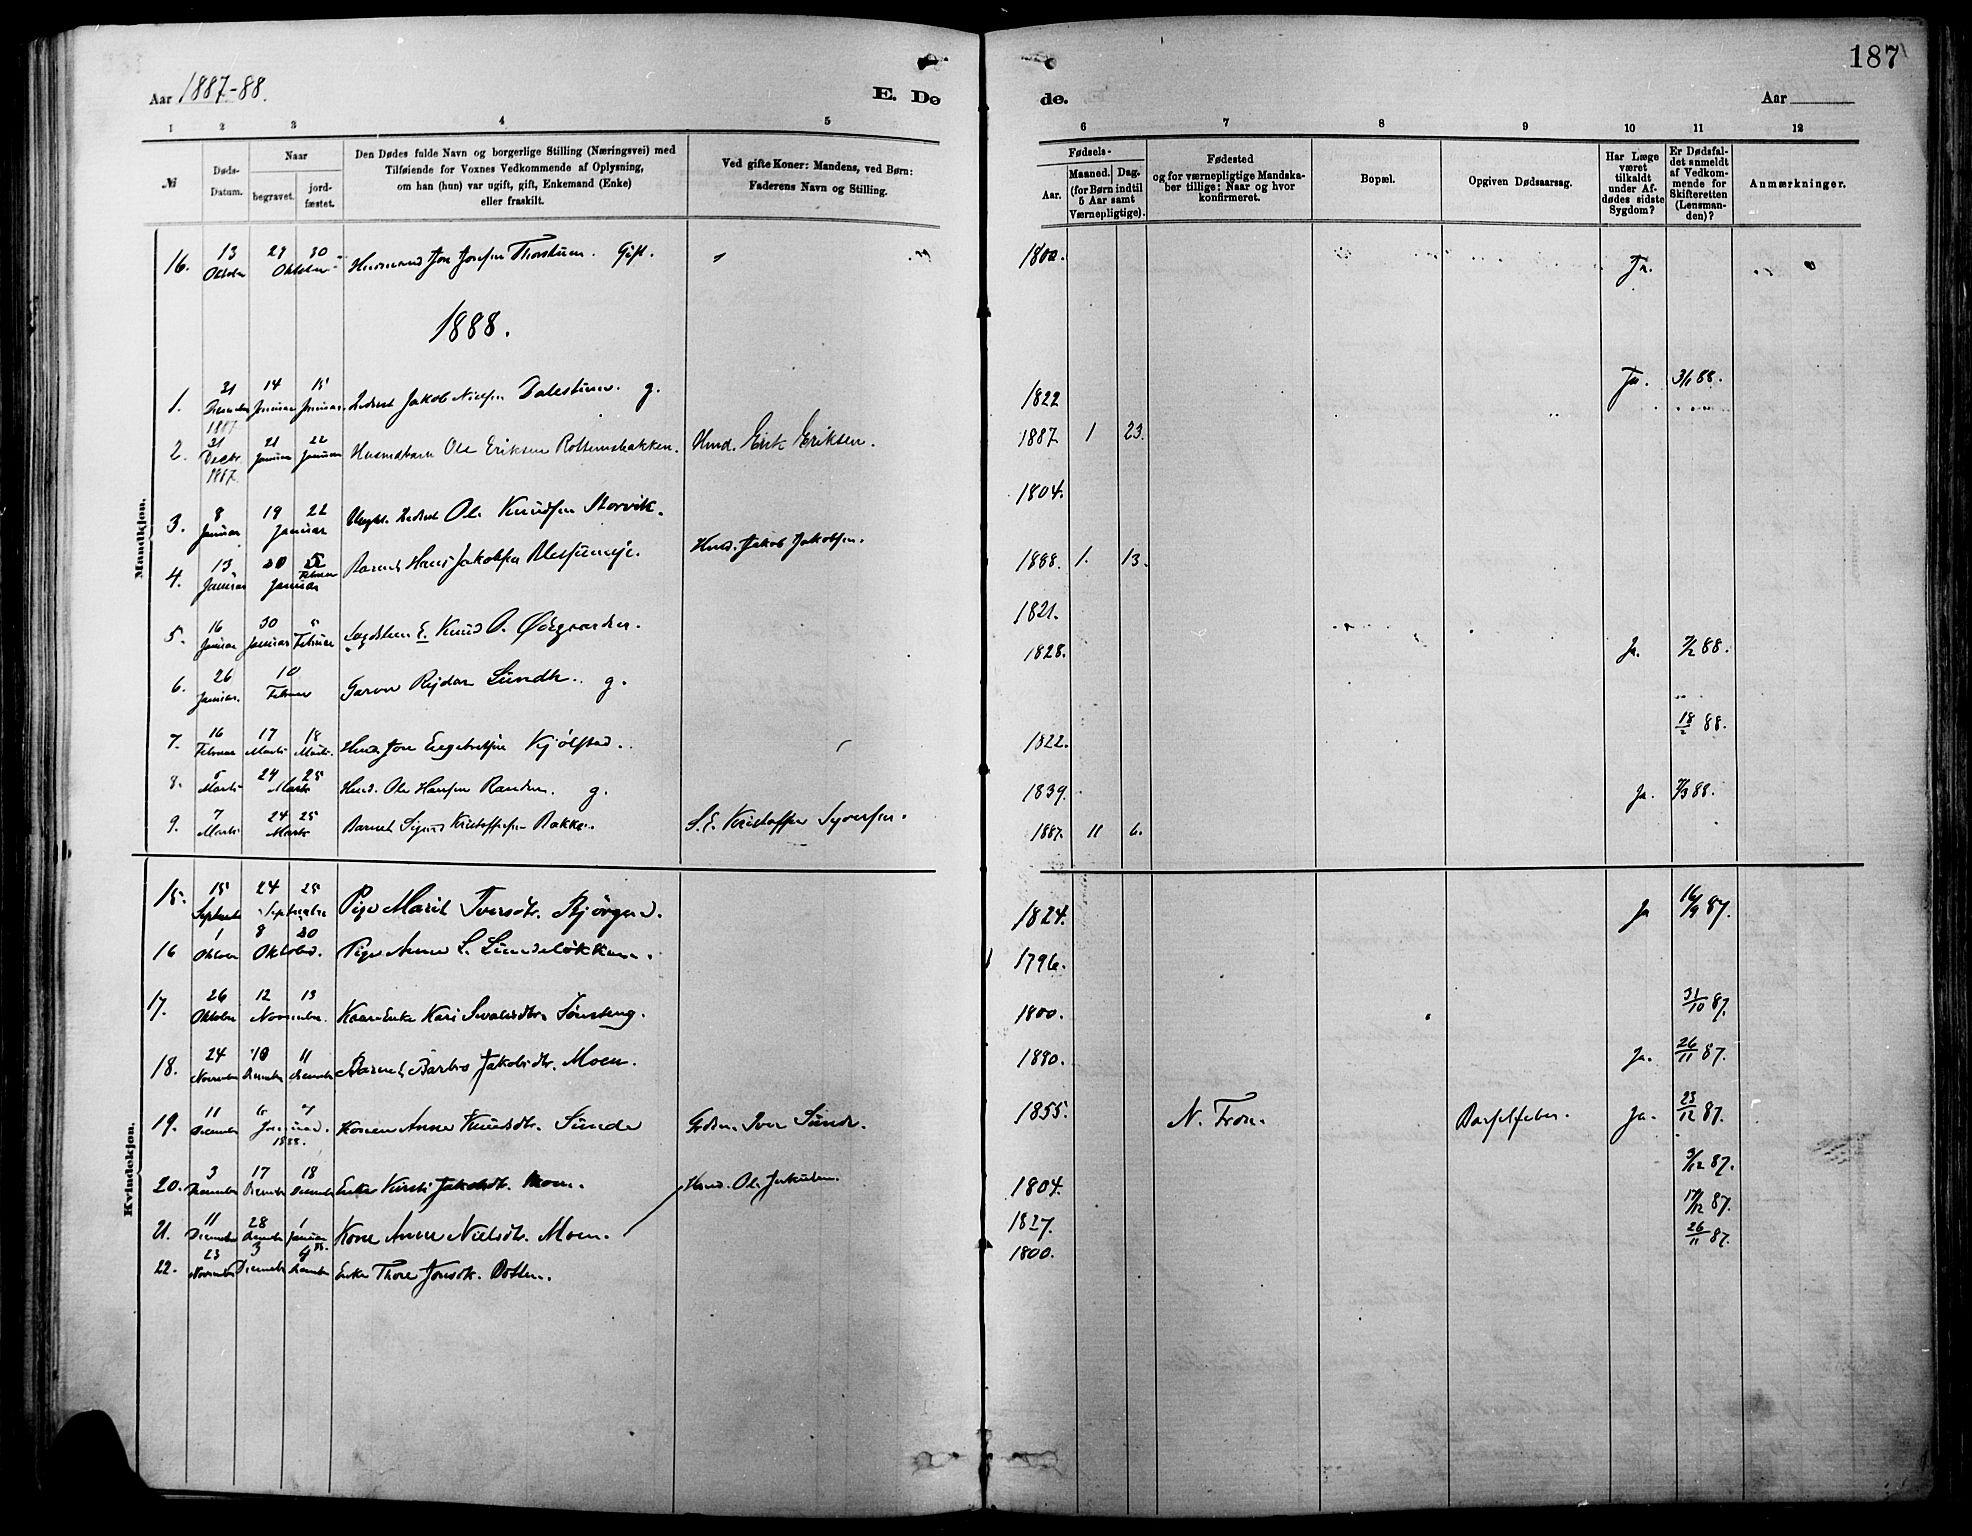 SAH, Vågå prestekontor, Ministerialbok nr. 9, 1886-1904, s. 187